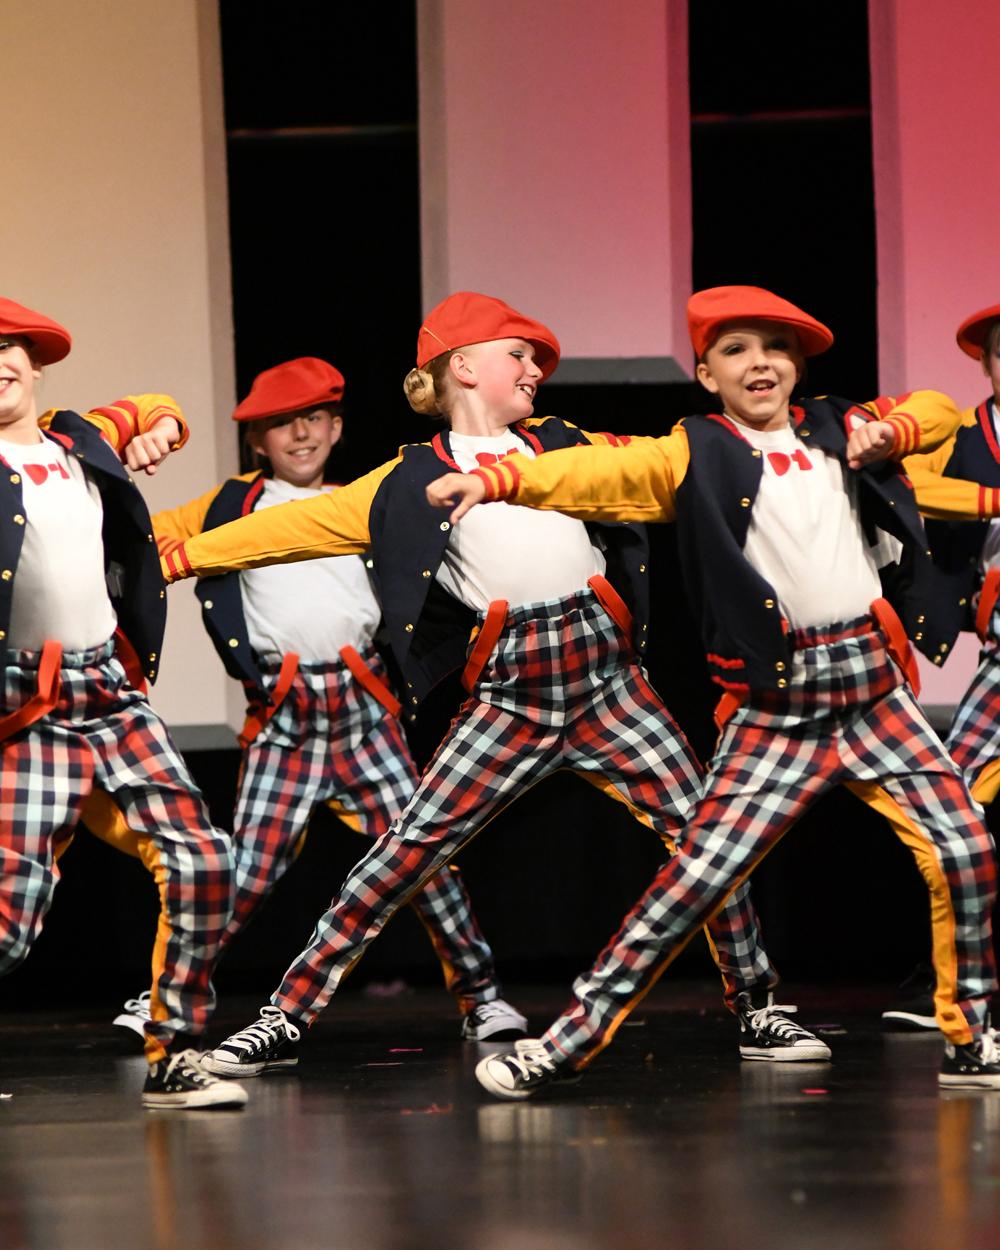 Old School Hiphop Dance : school, hiphop, dance, Innovative, Dance